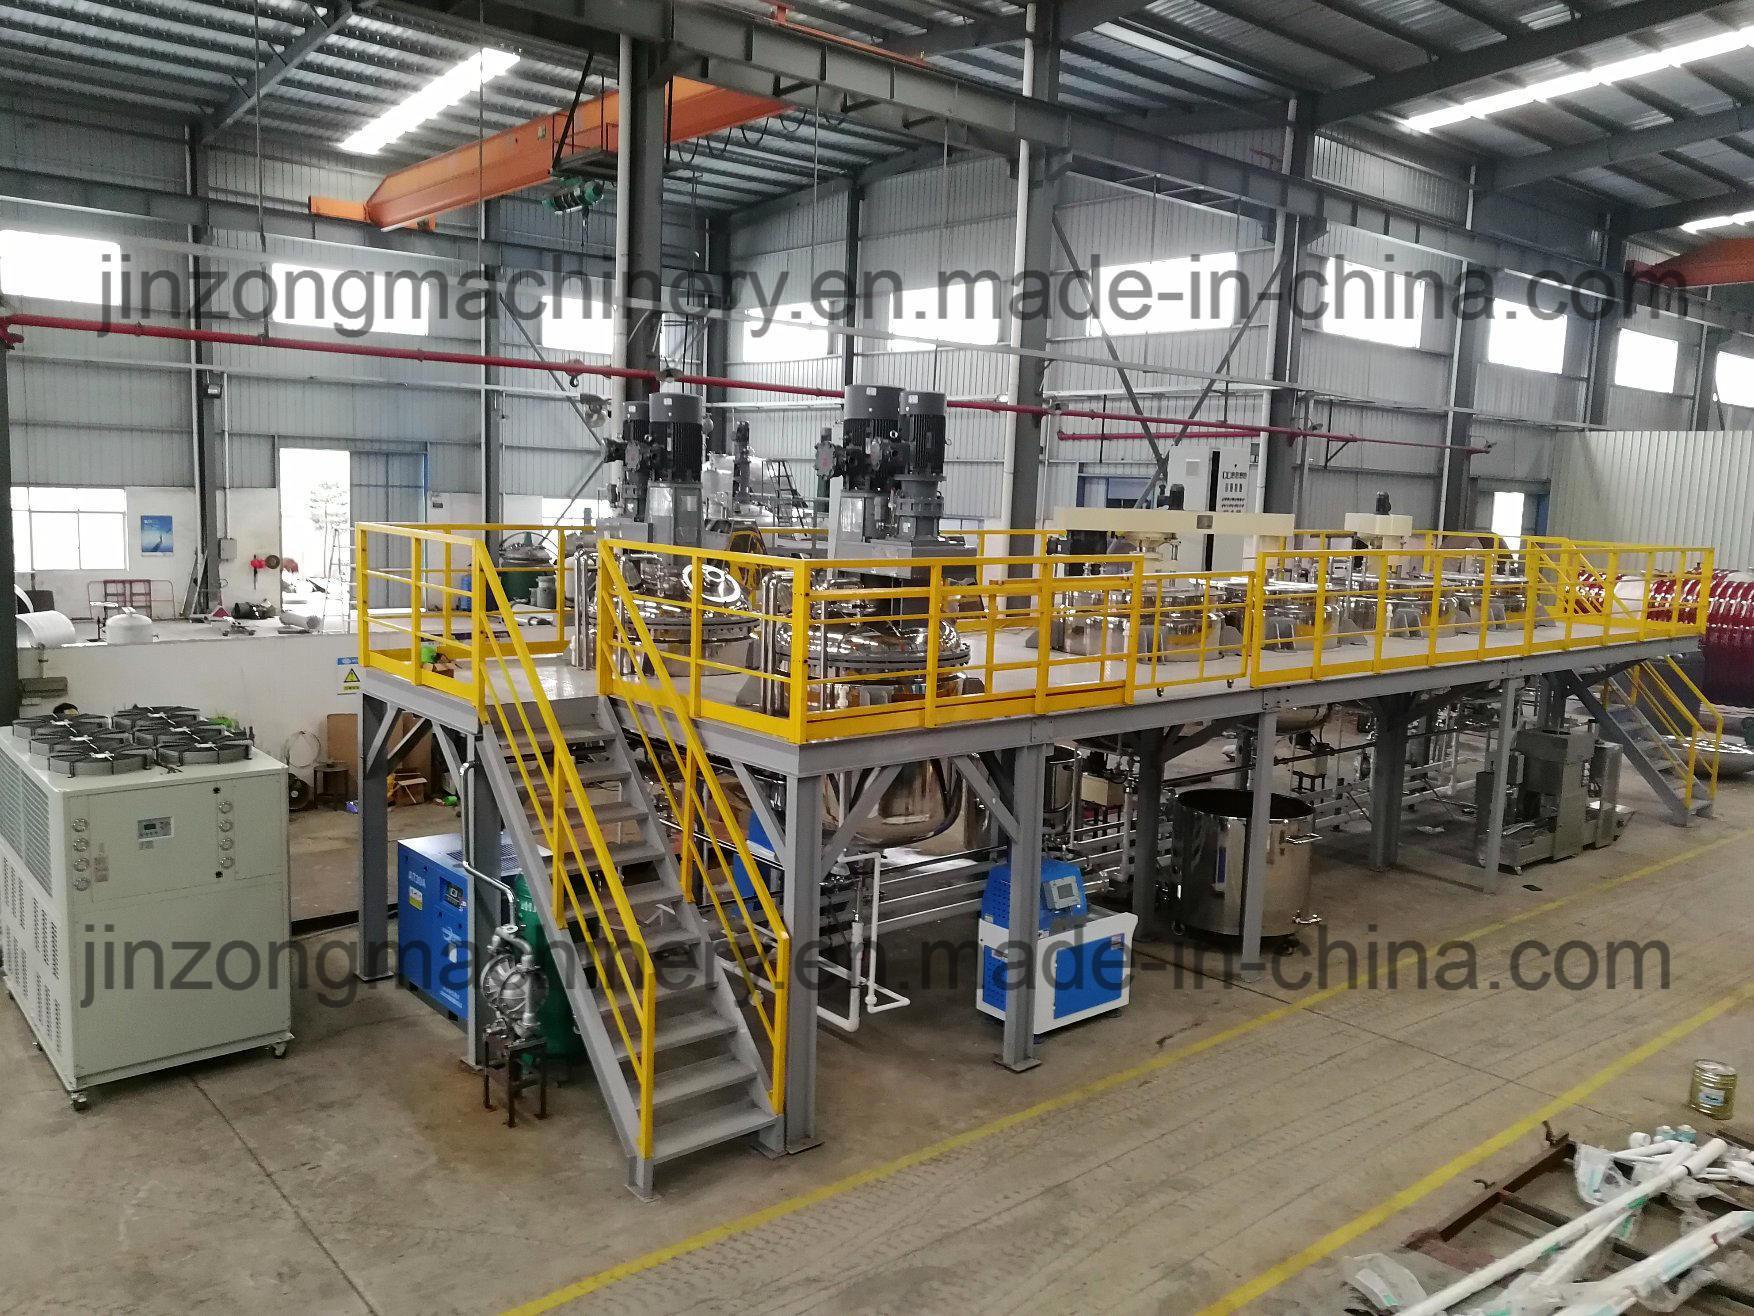 China Coating&Paints Production Line